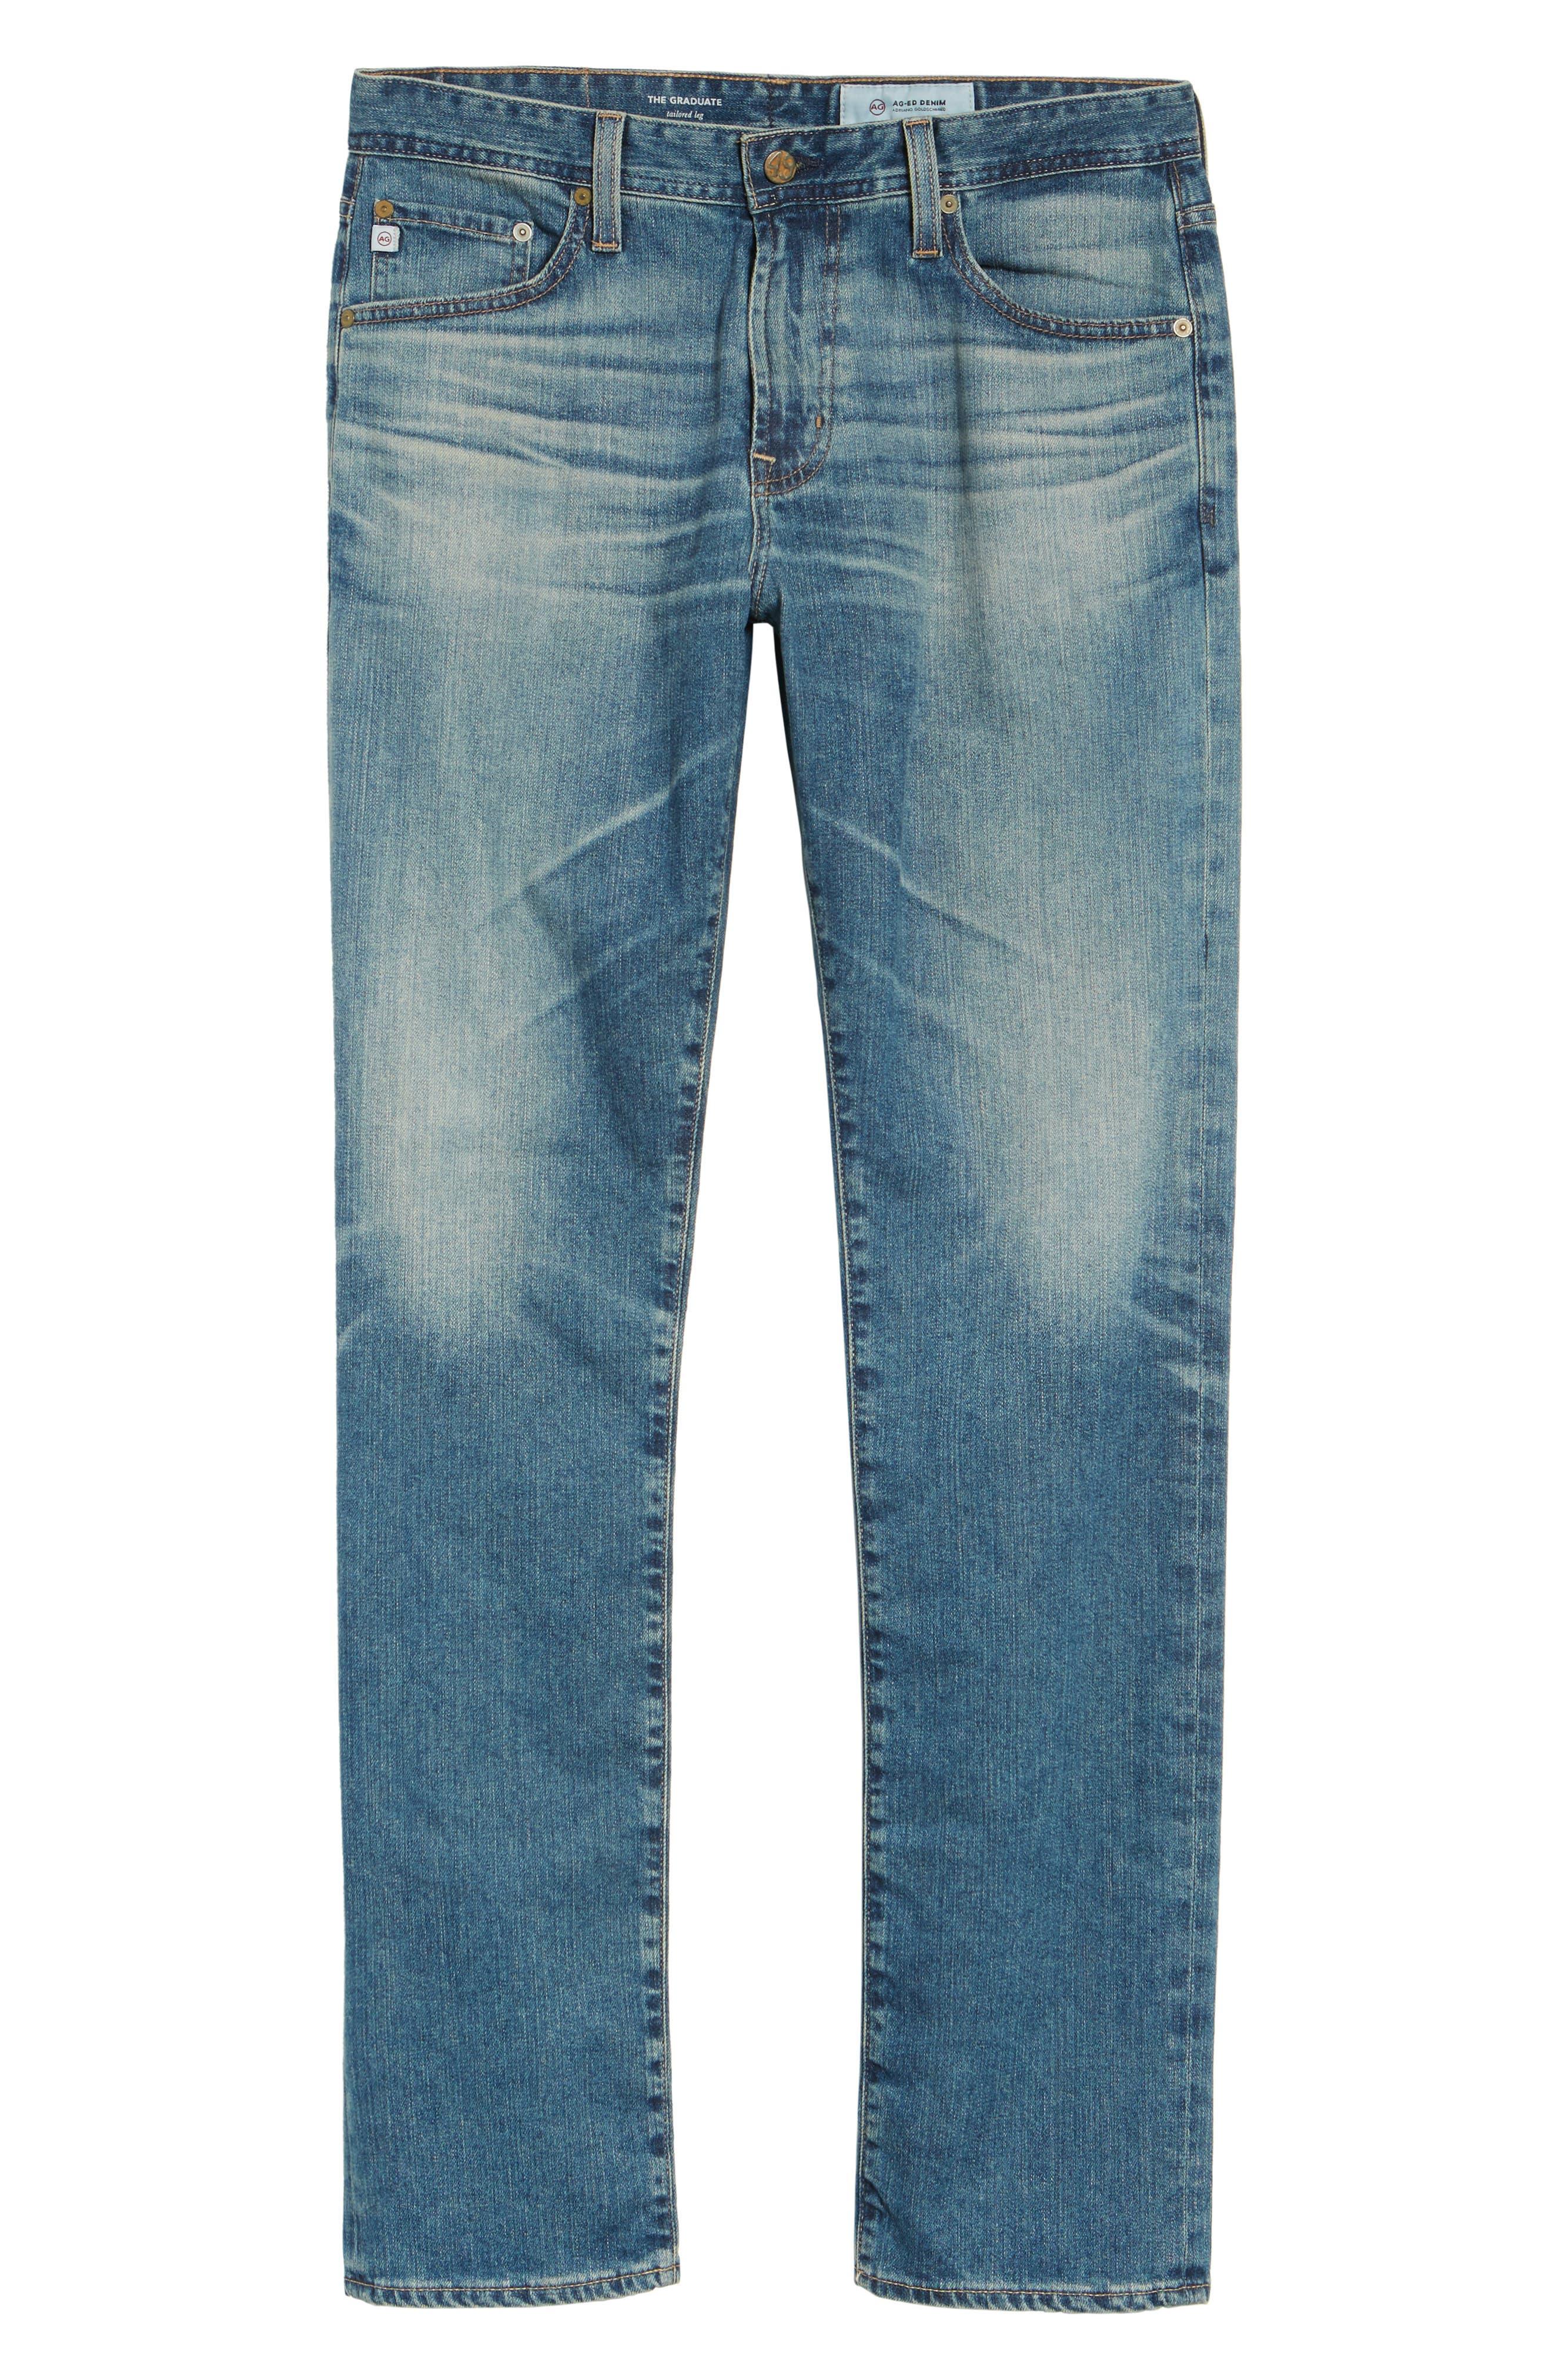 Graduate Slim Straight Leg Jeans,                             Alternate thumbnail 6, color,                             430